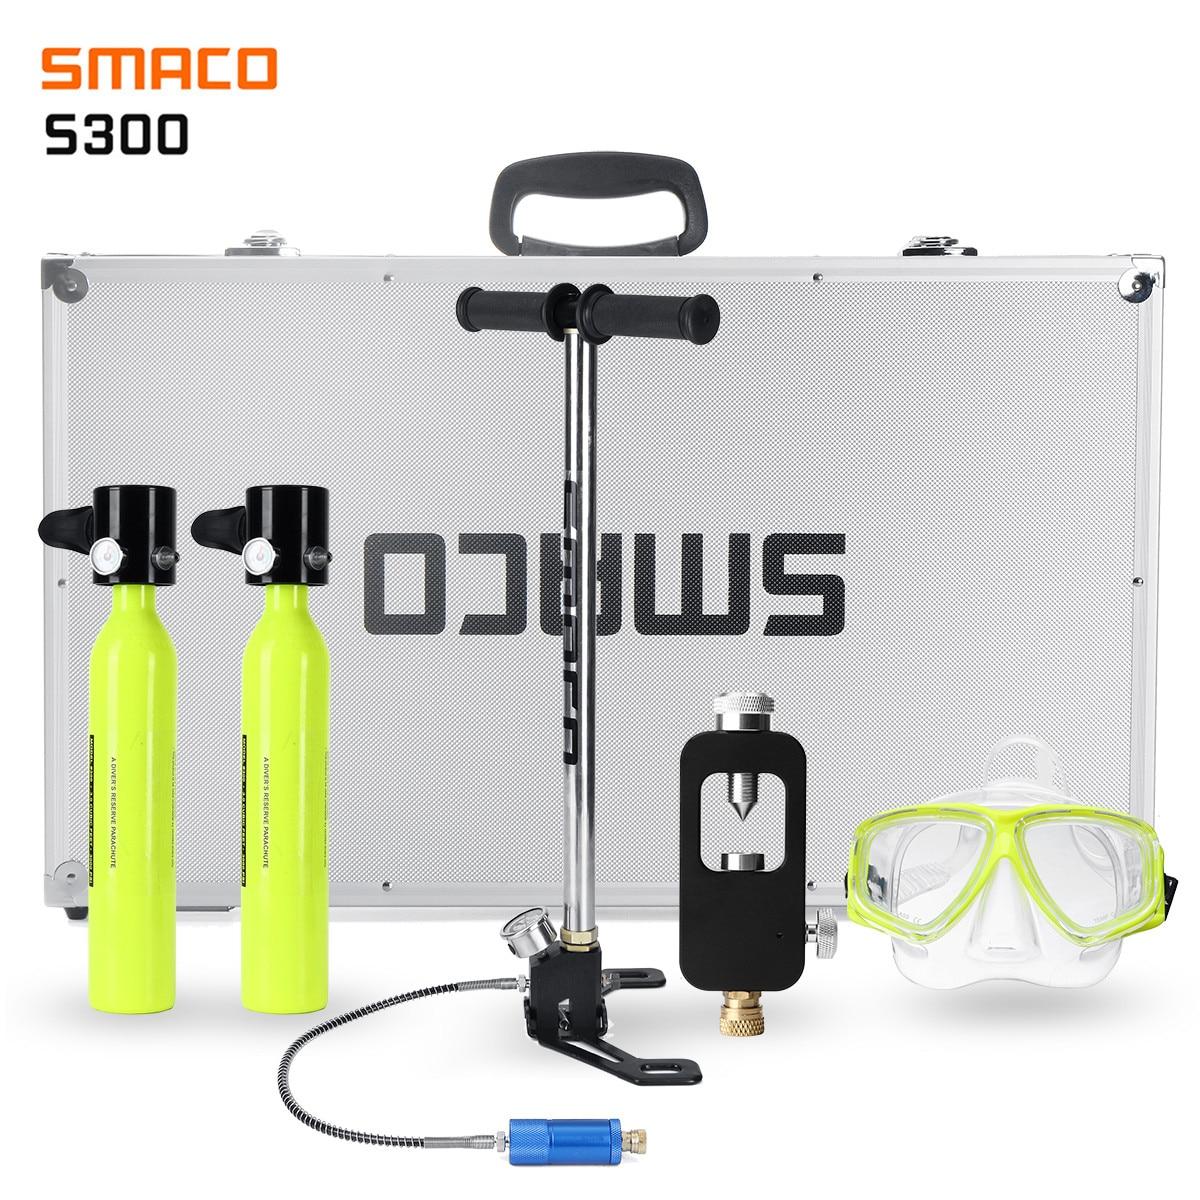 SMACO 2 People Set Diving System Mini Scuba Cylinder Scuba Oxygen Reserve Air Tank Pump Aluminum Box Snorkeling Diving Equipment